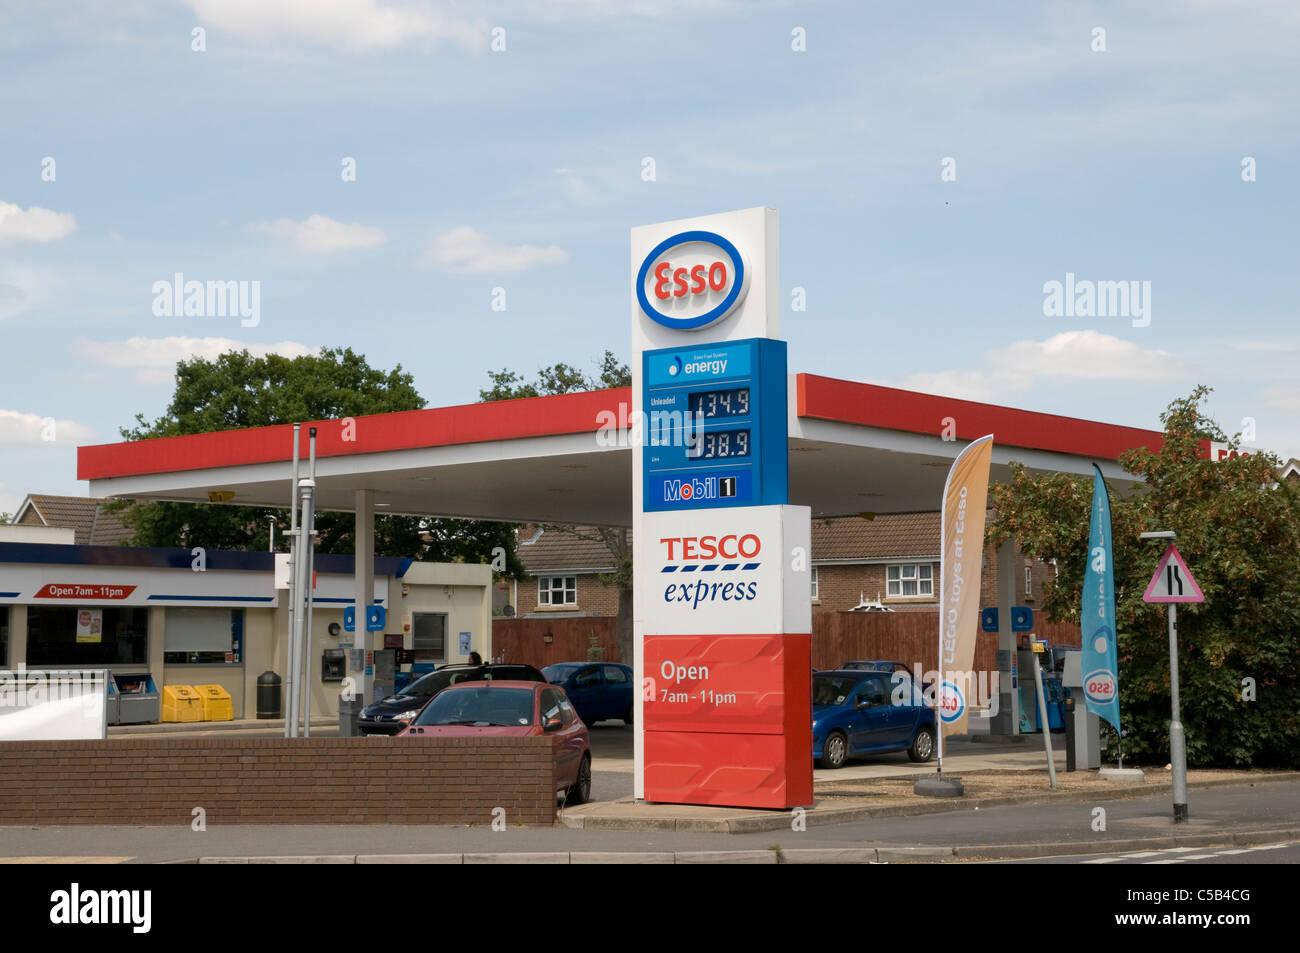 Esso petrol station 2011 - Stock Image